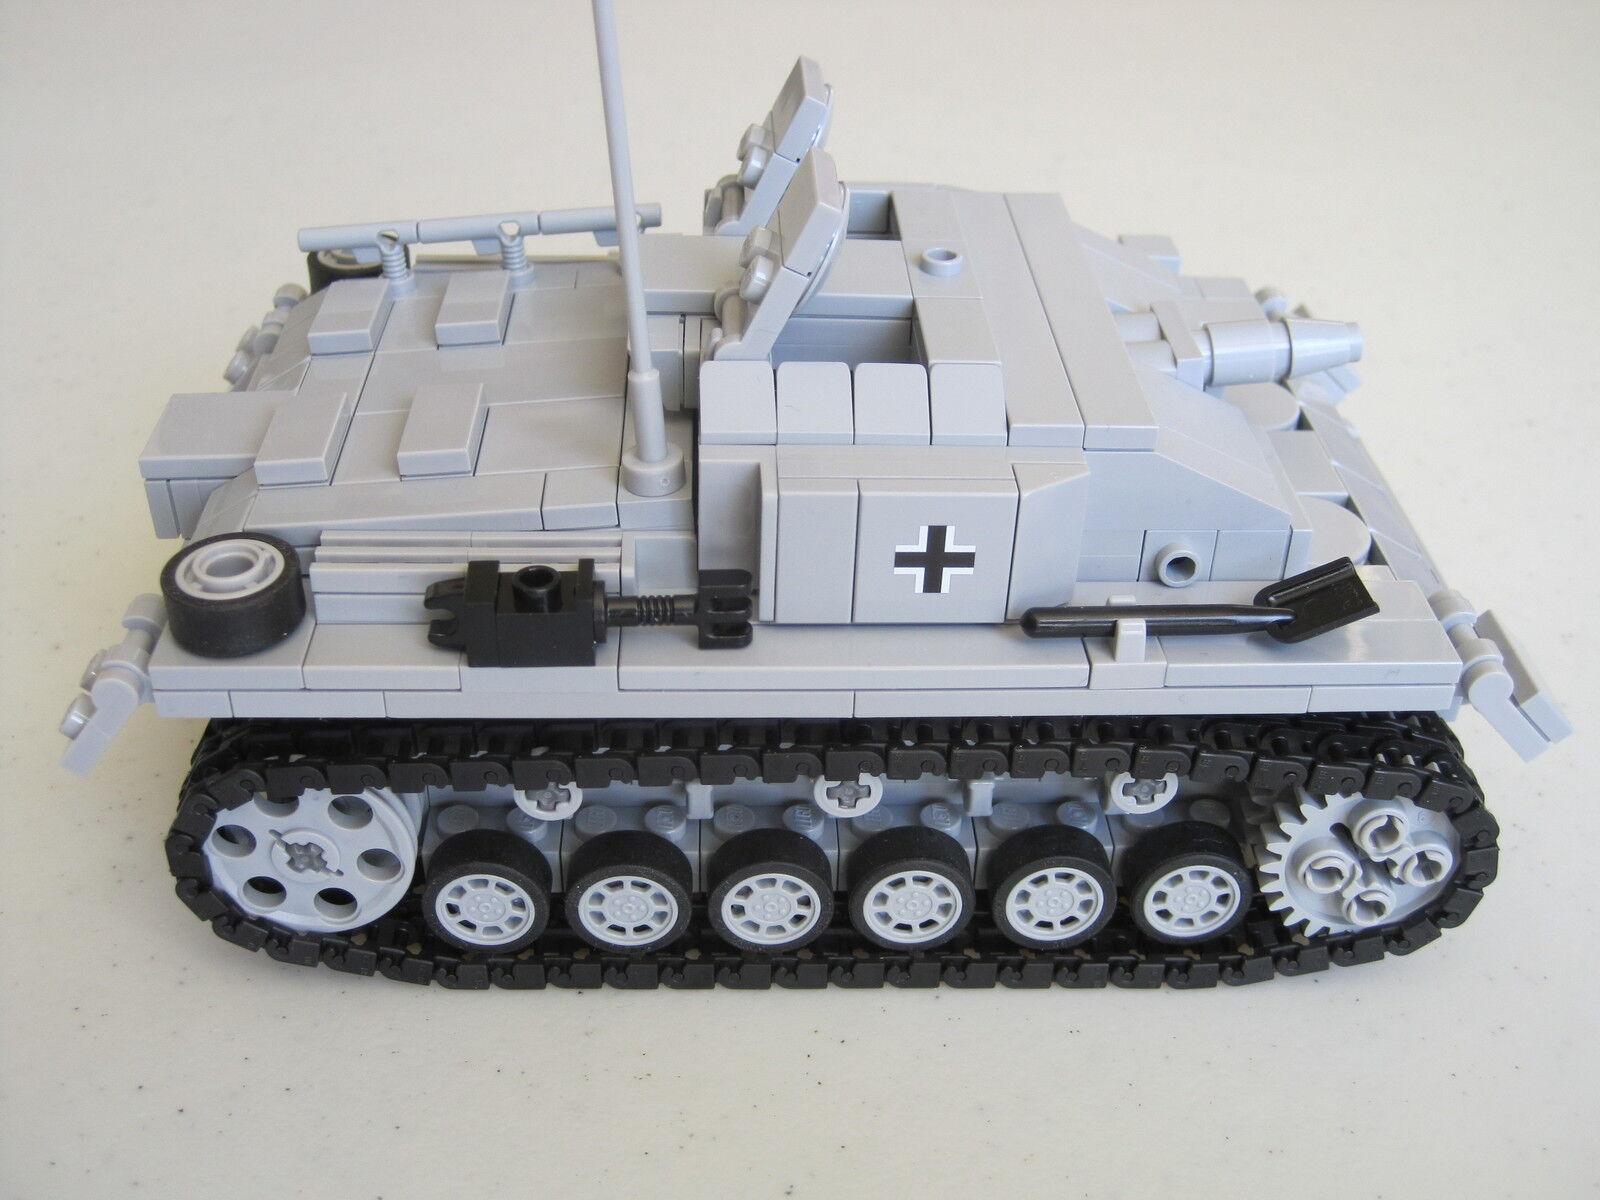 Lego WW2 GERMAN Vehicle StuG III Sd.Kfz 142 142 142 ausf. E Tank Artillery NEW 2dac3e